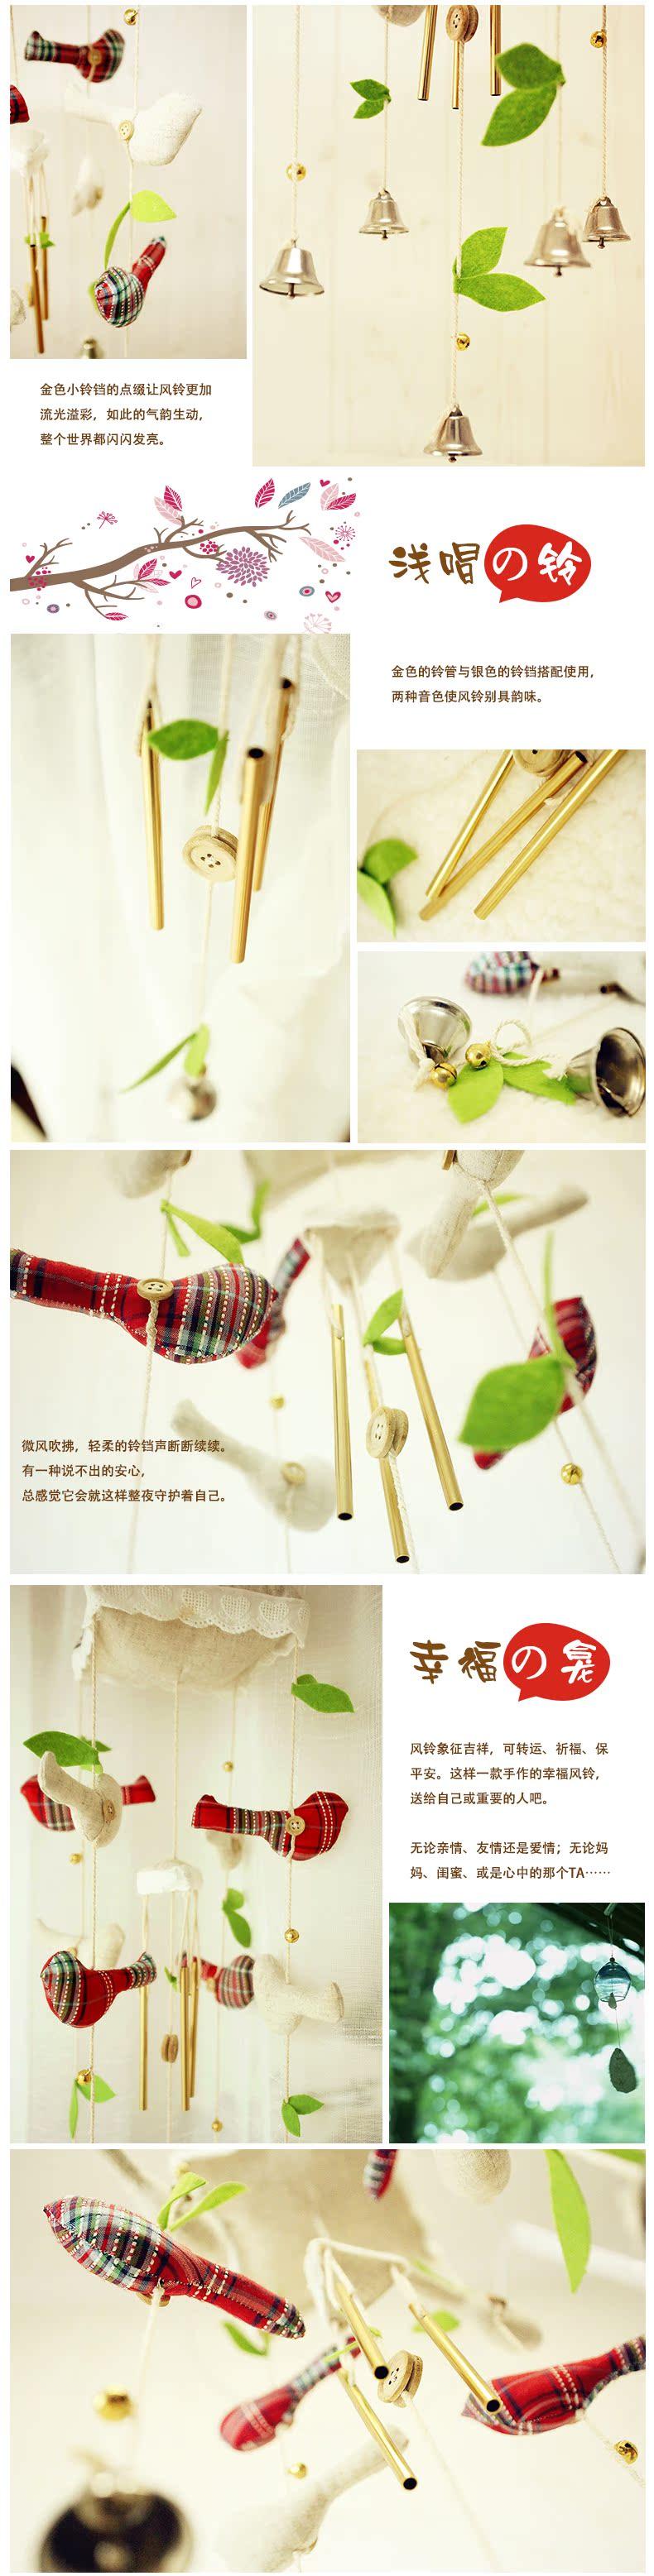 Aga manually Aka flagship Japanese wind chimes handmade cloth ornaments door trim metal wind chimes wind chimes Robin